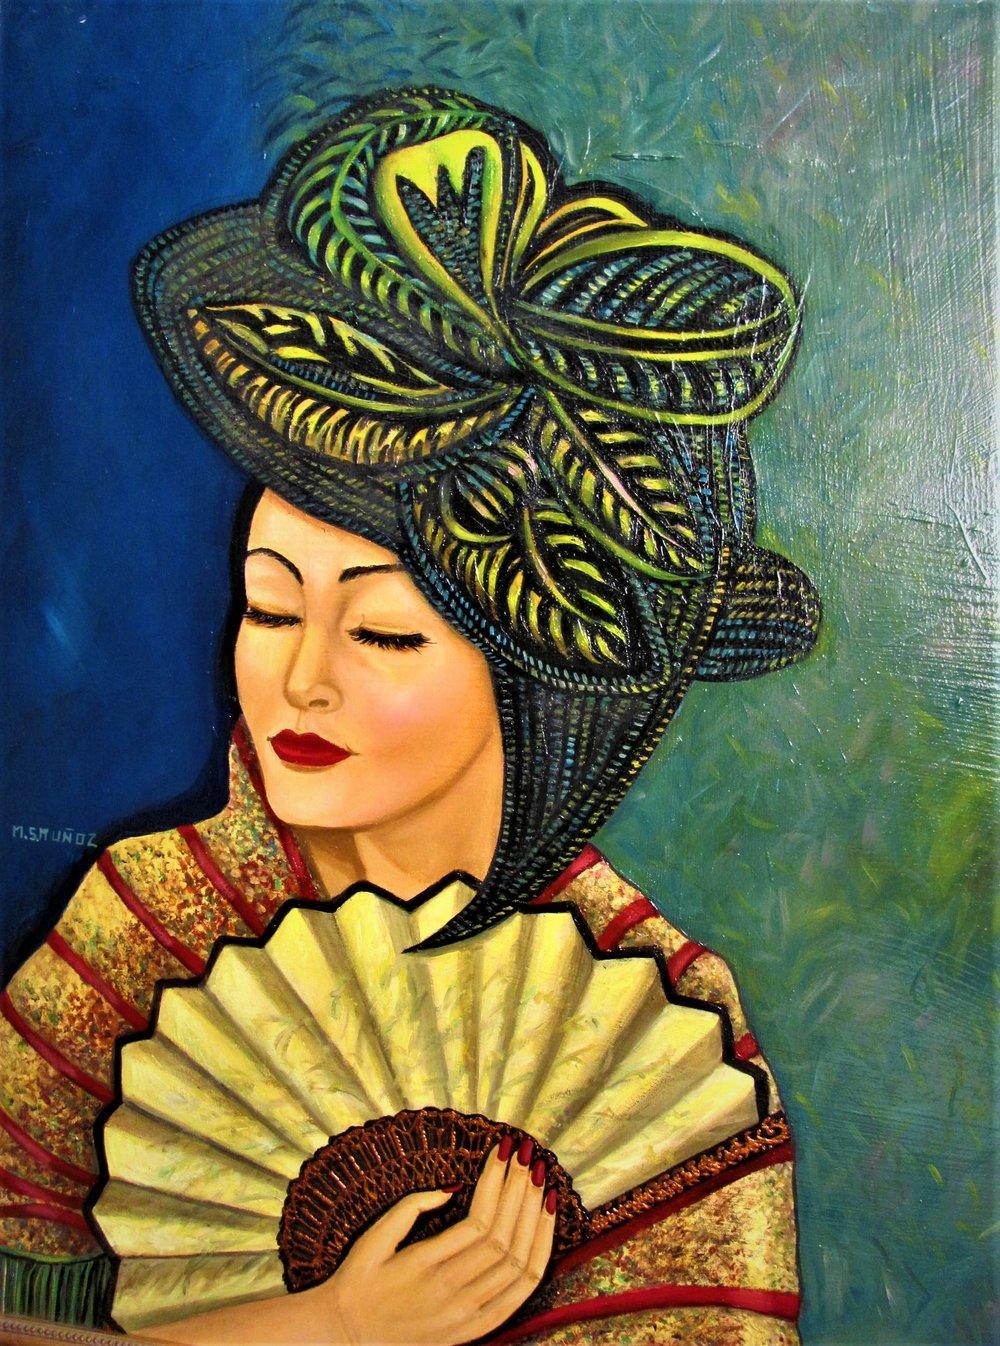 Linda by Maria Soccoro Munoz